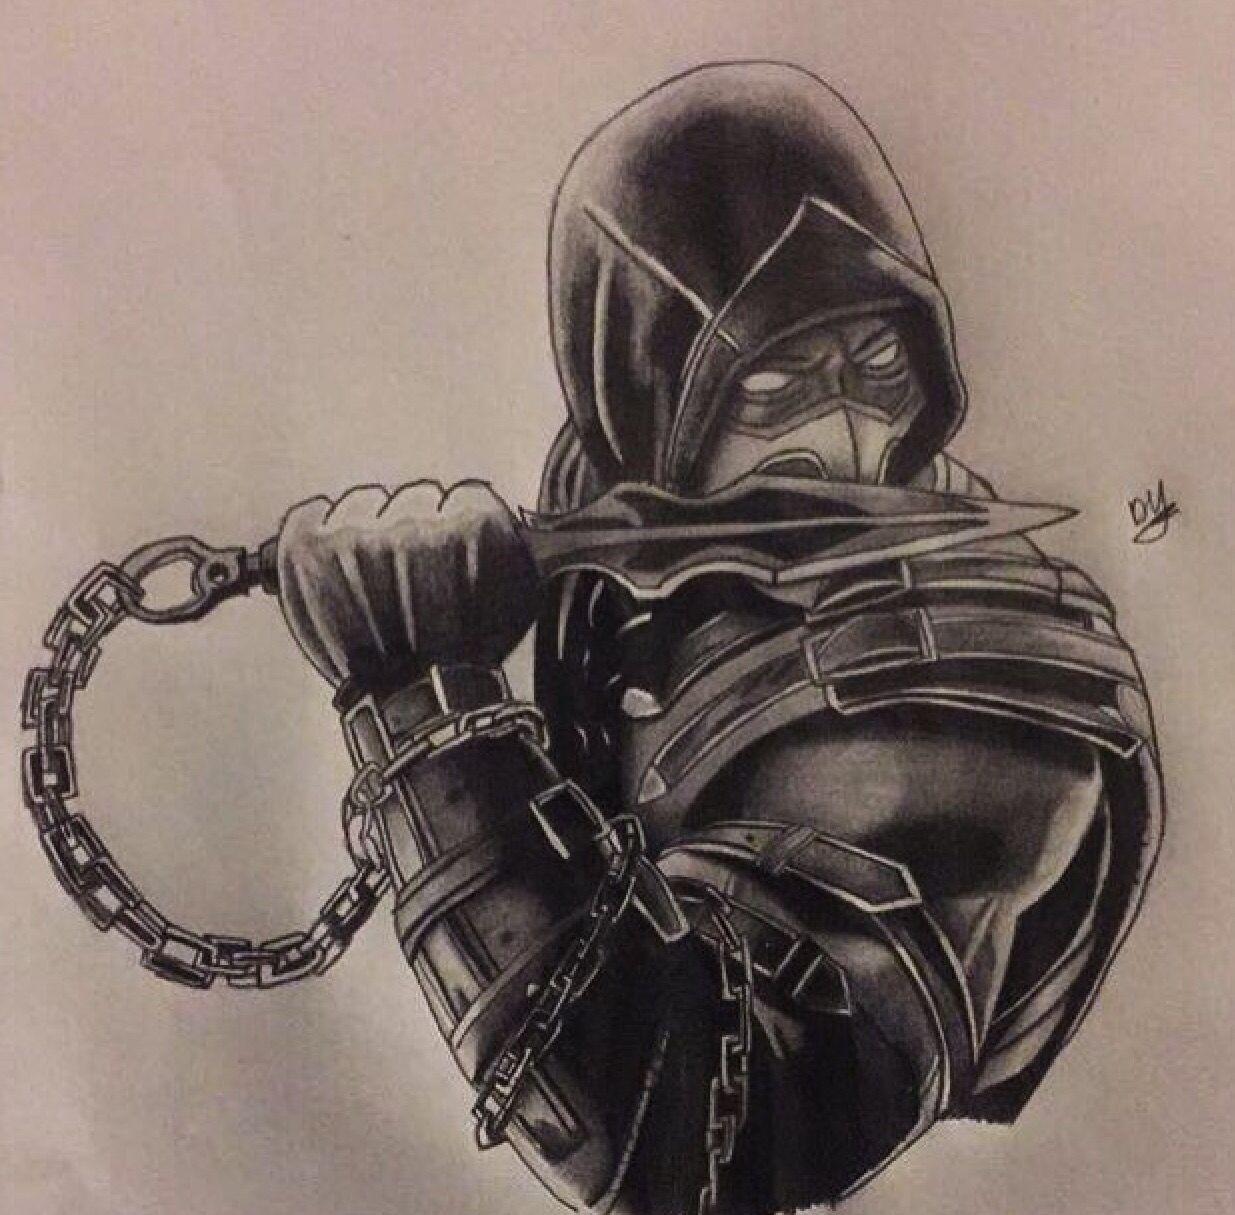 Scorpion From Mortal Kombat Drawing Mortal Kombat Art Mortal